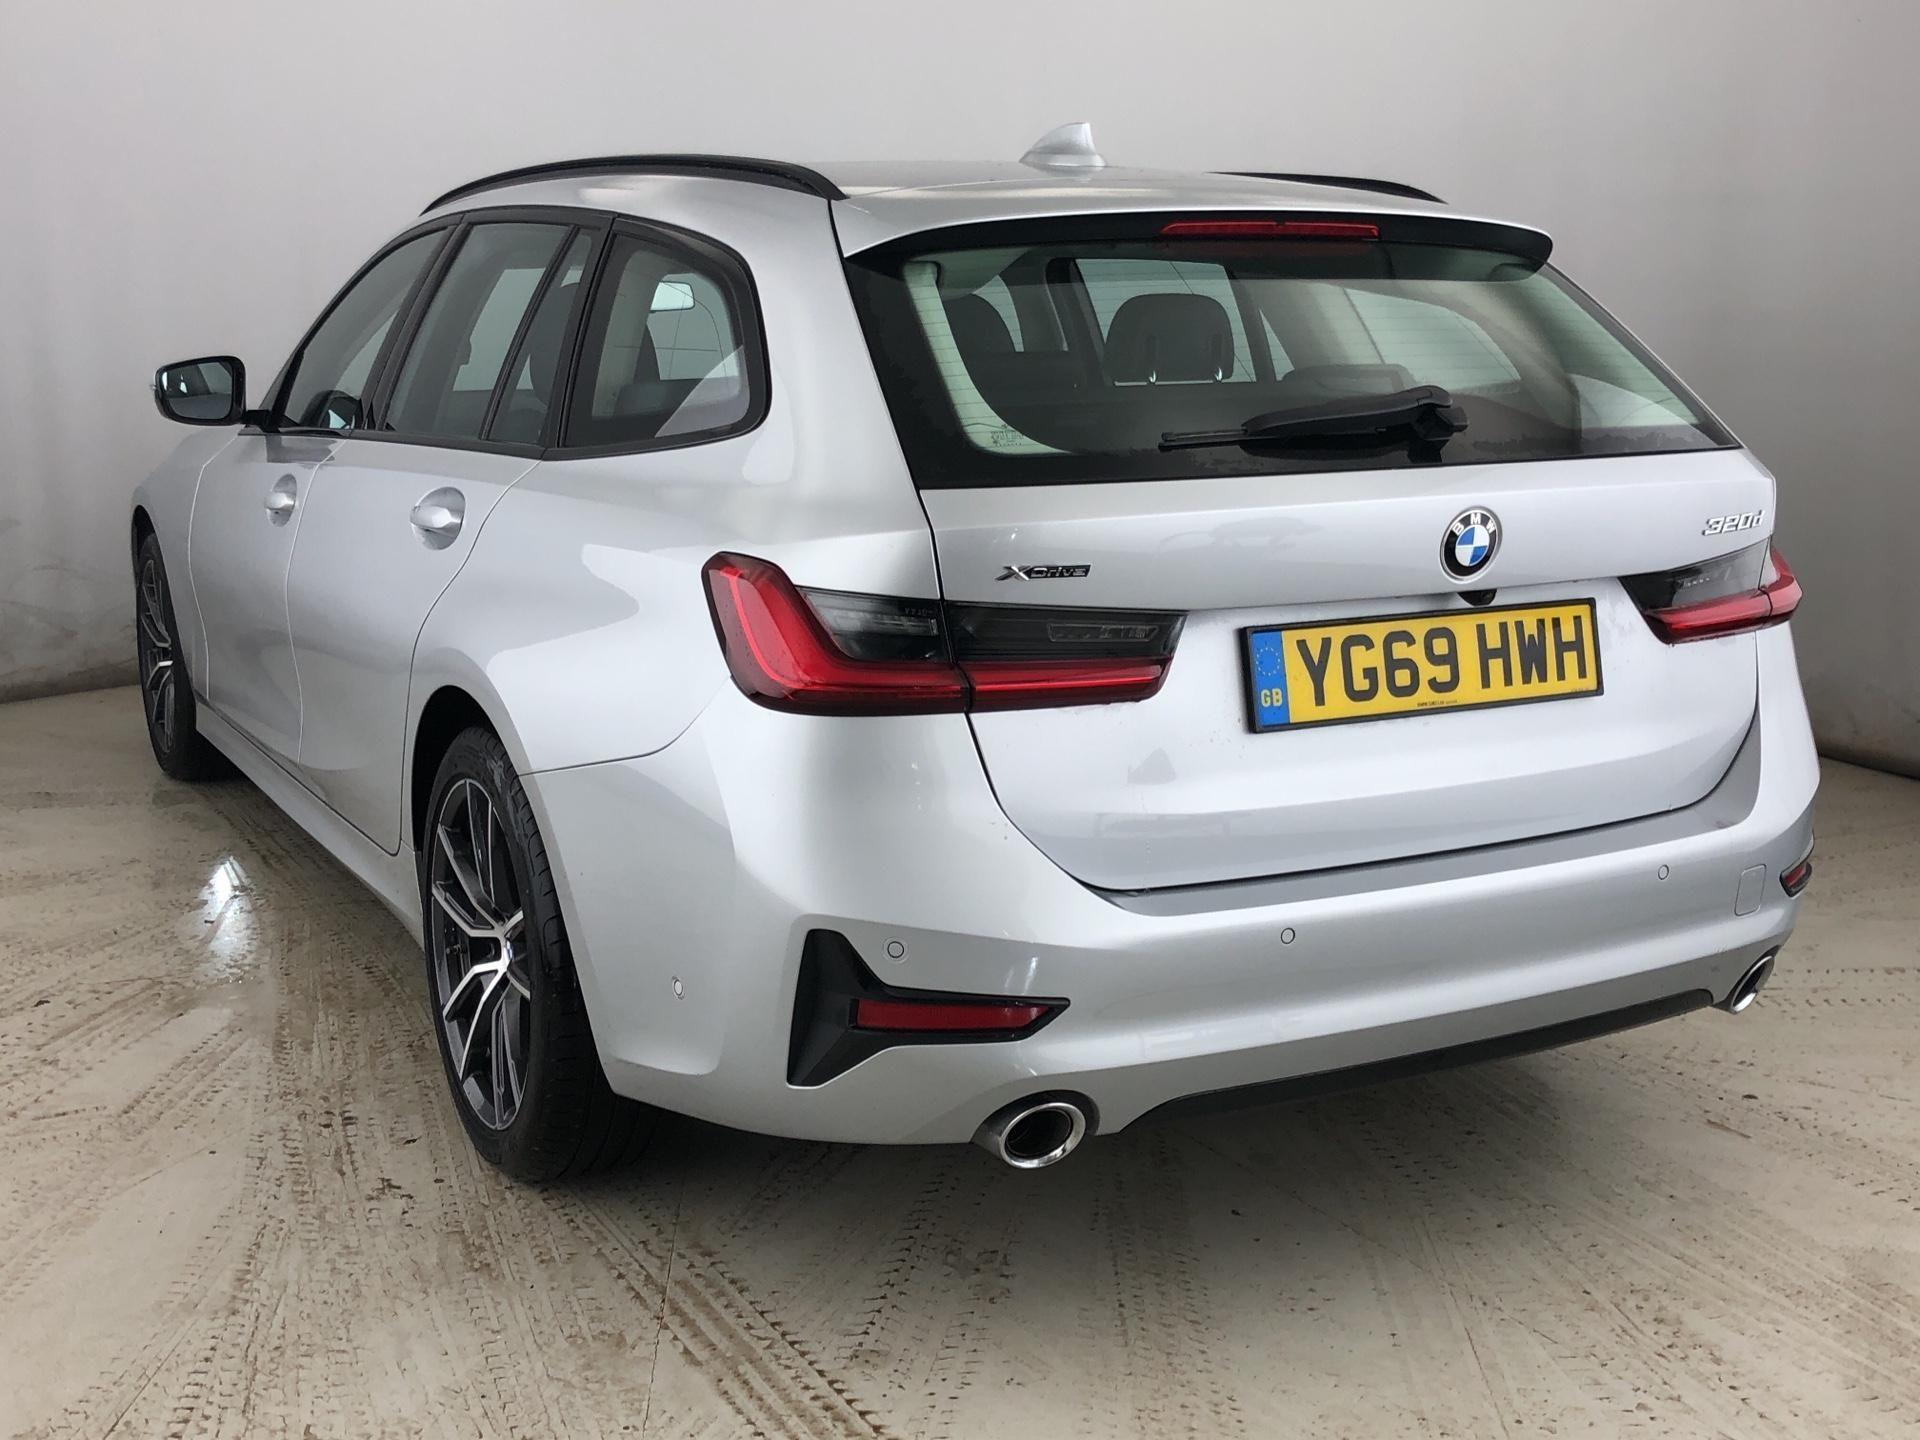 Image 2 - BMW 320d xDrive Sport Touring (YG69HWH)